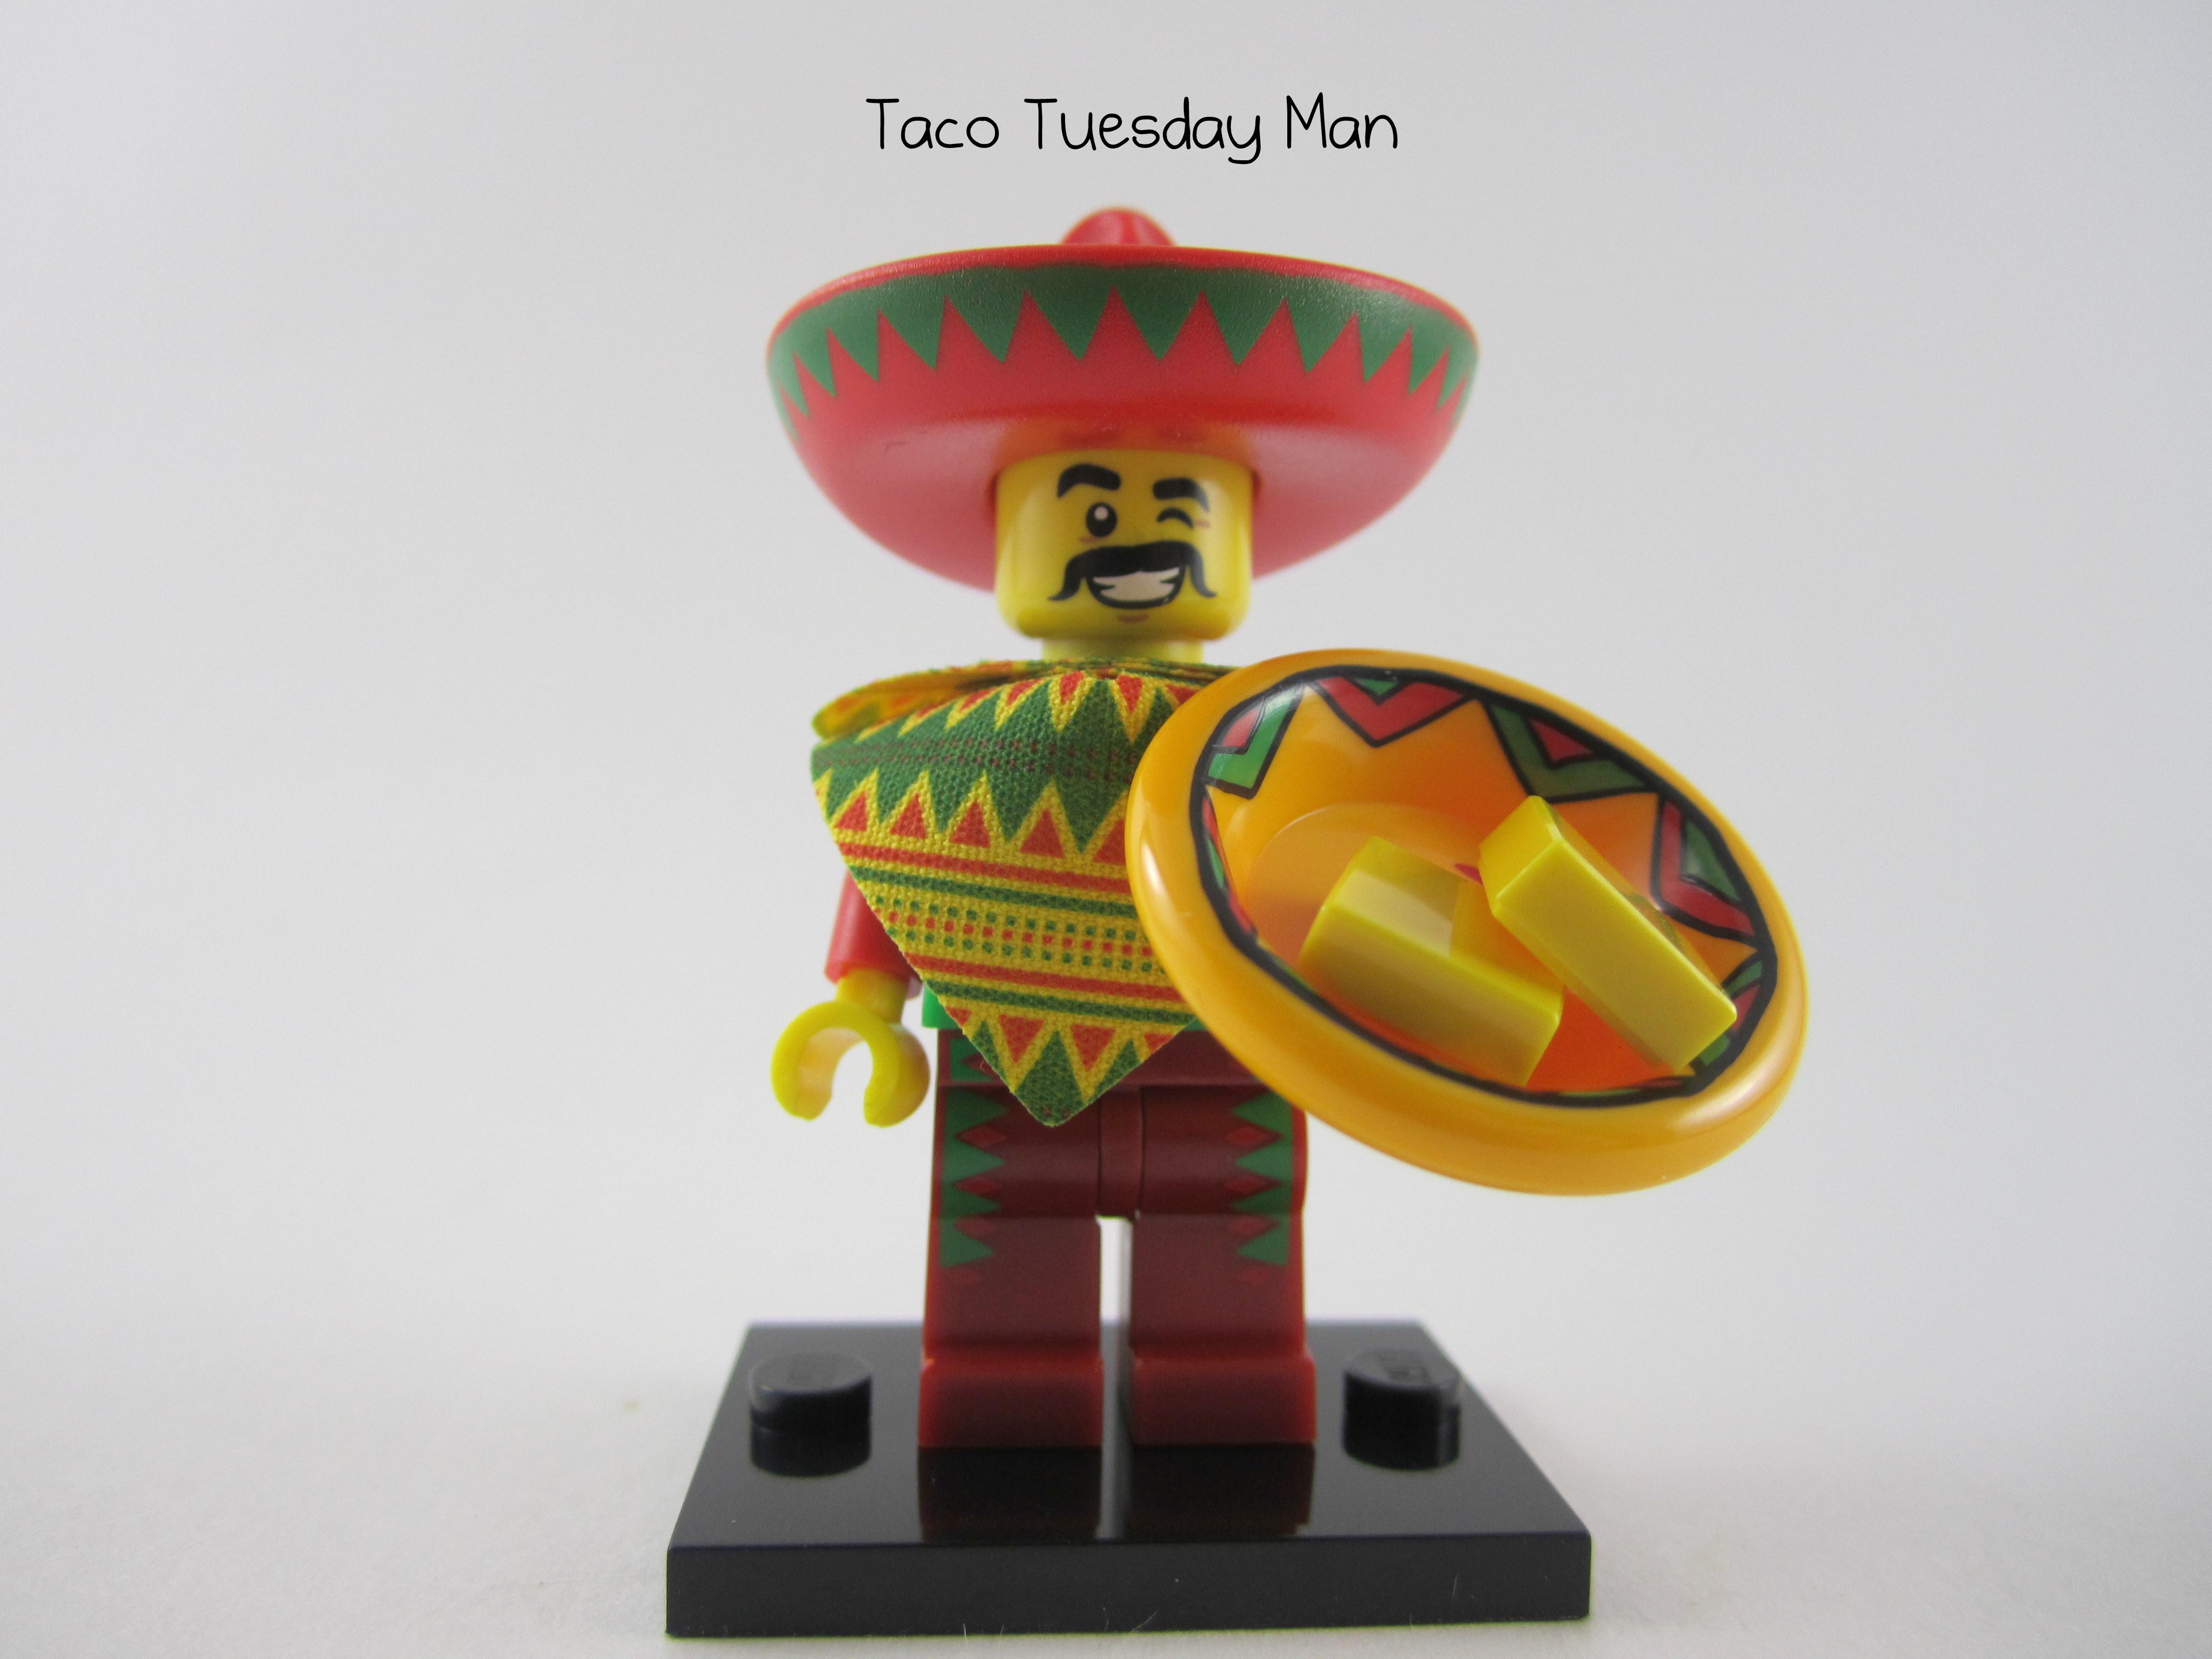 Taco Tuesday Man Minifig